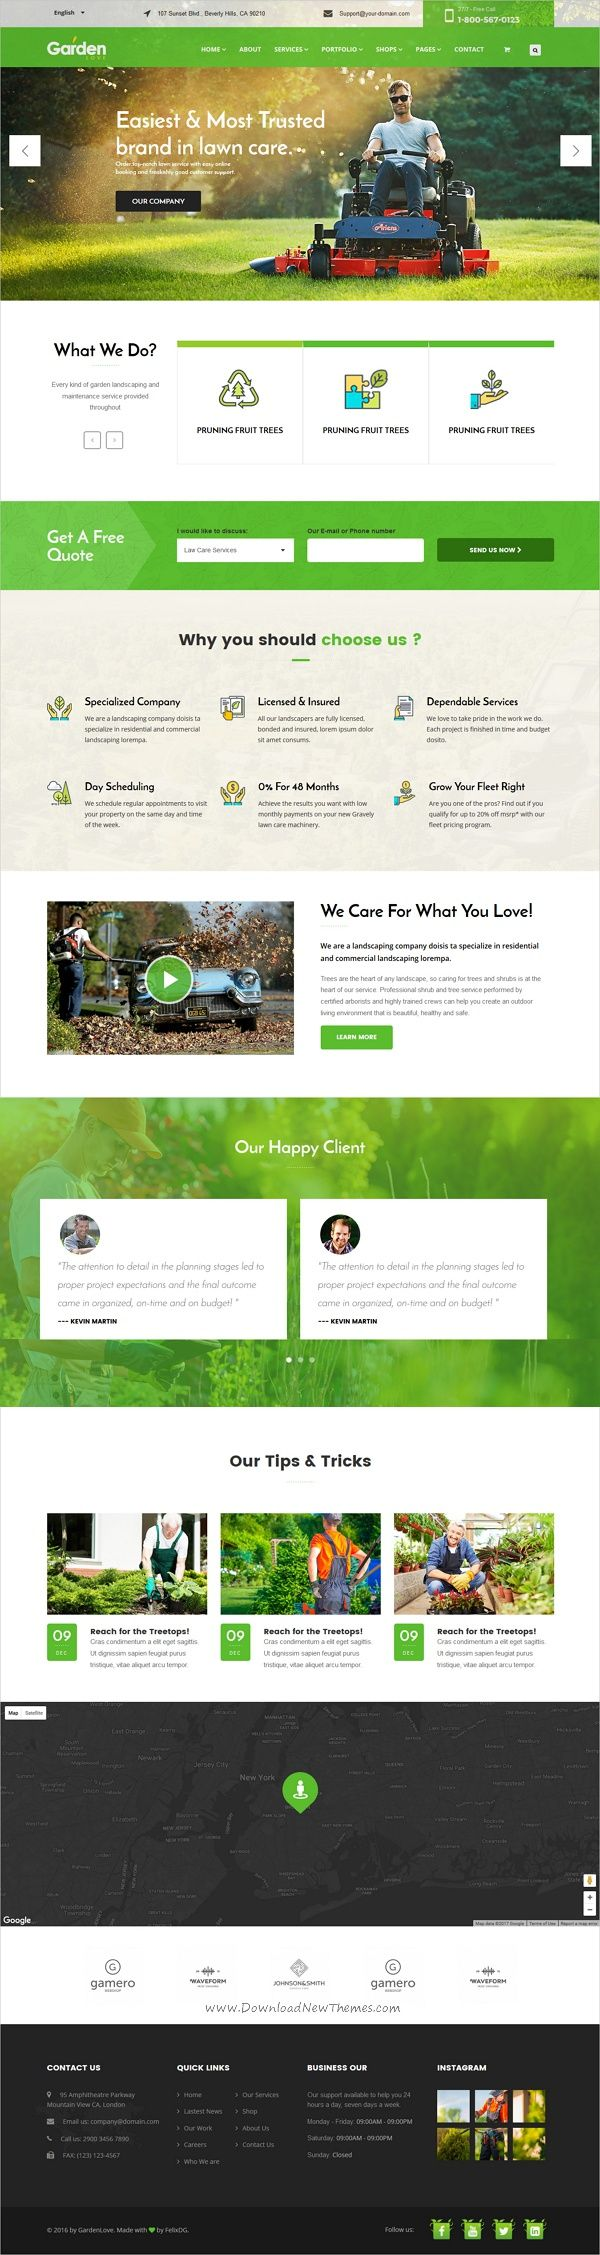 Garden love is a wonderful 3in1 responsive #HTML5 bootstrap template for #gardener, lawn services, #agriculture service websites download now➩ https://themeforest.net/item/garden-love-landscaping-gardening-html-template/19515597?ref=Datasata